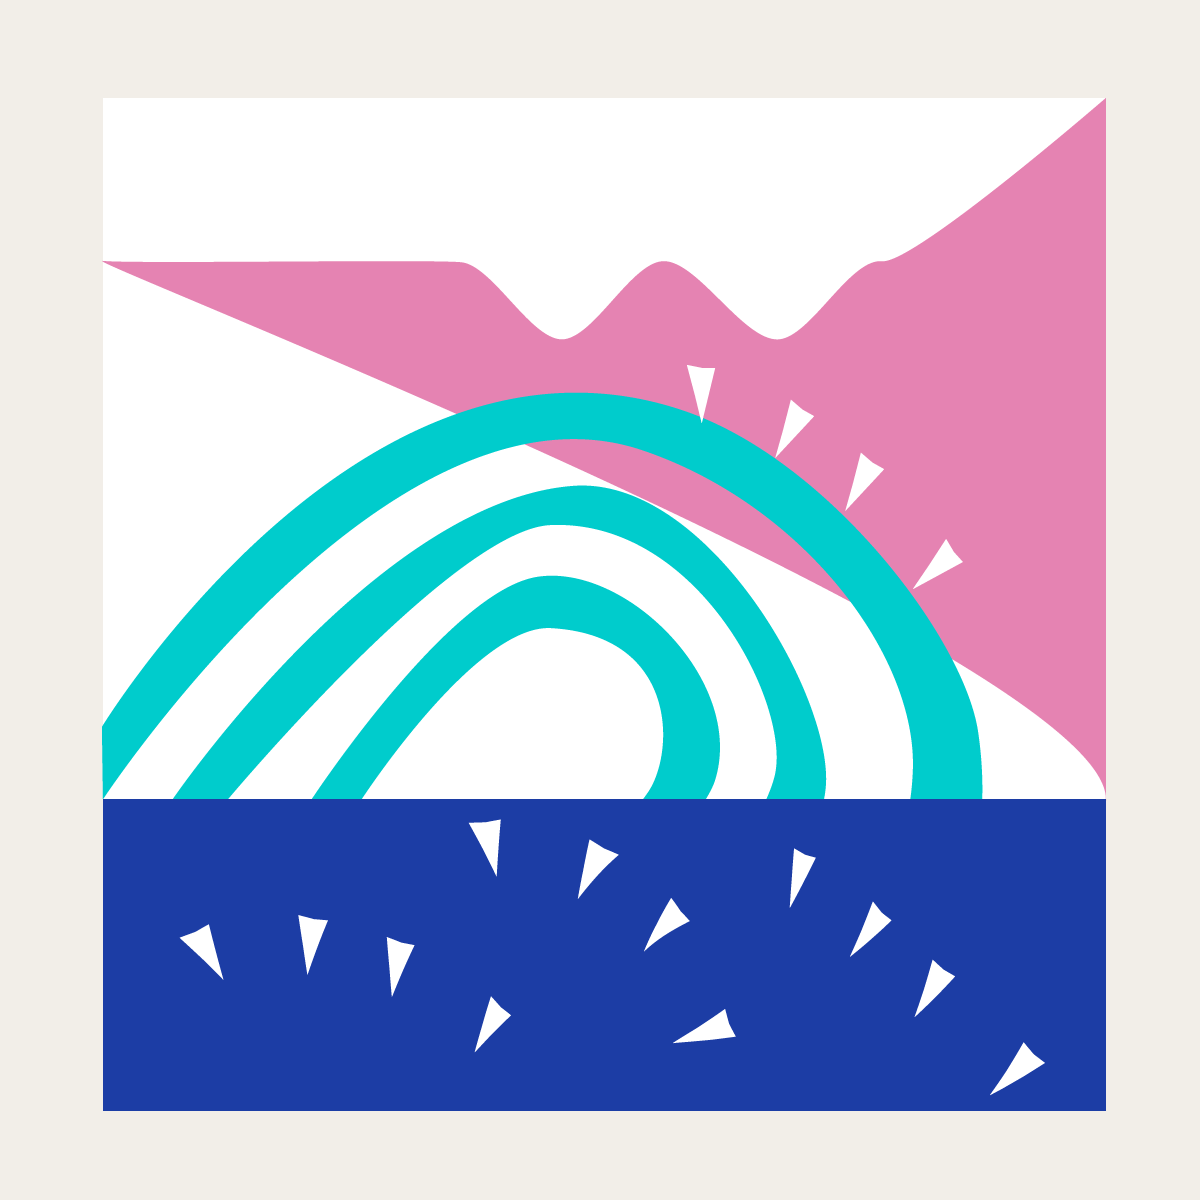 Summer waves illustration